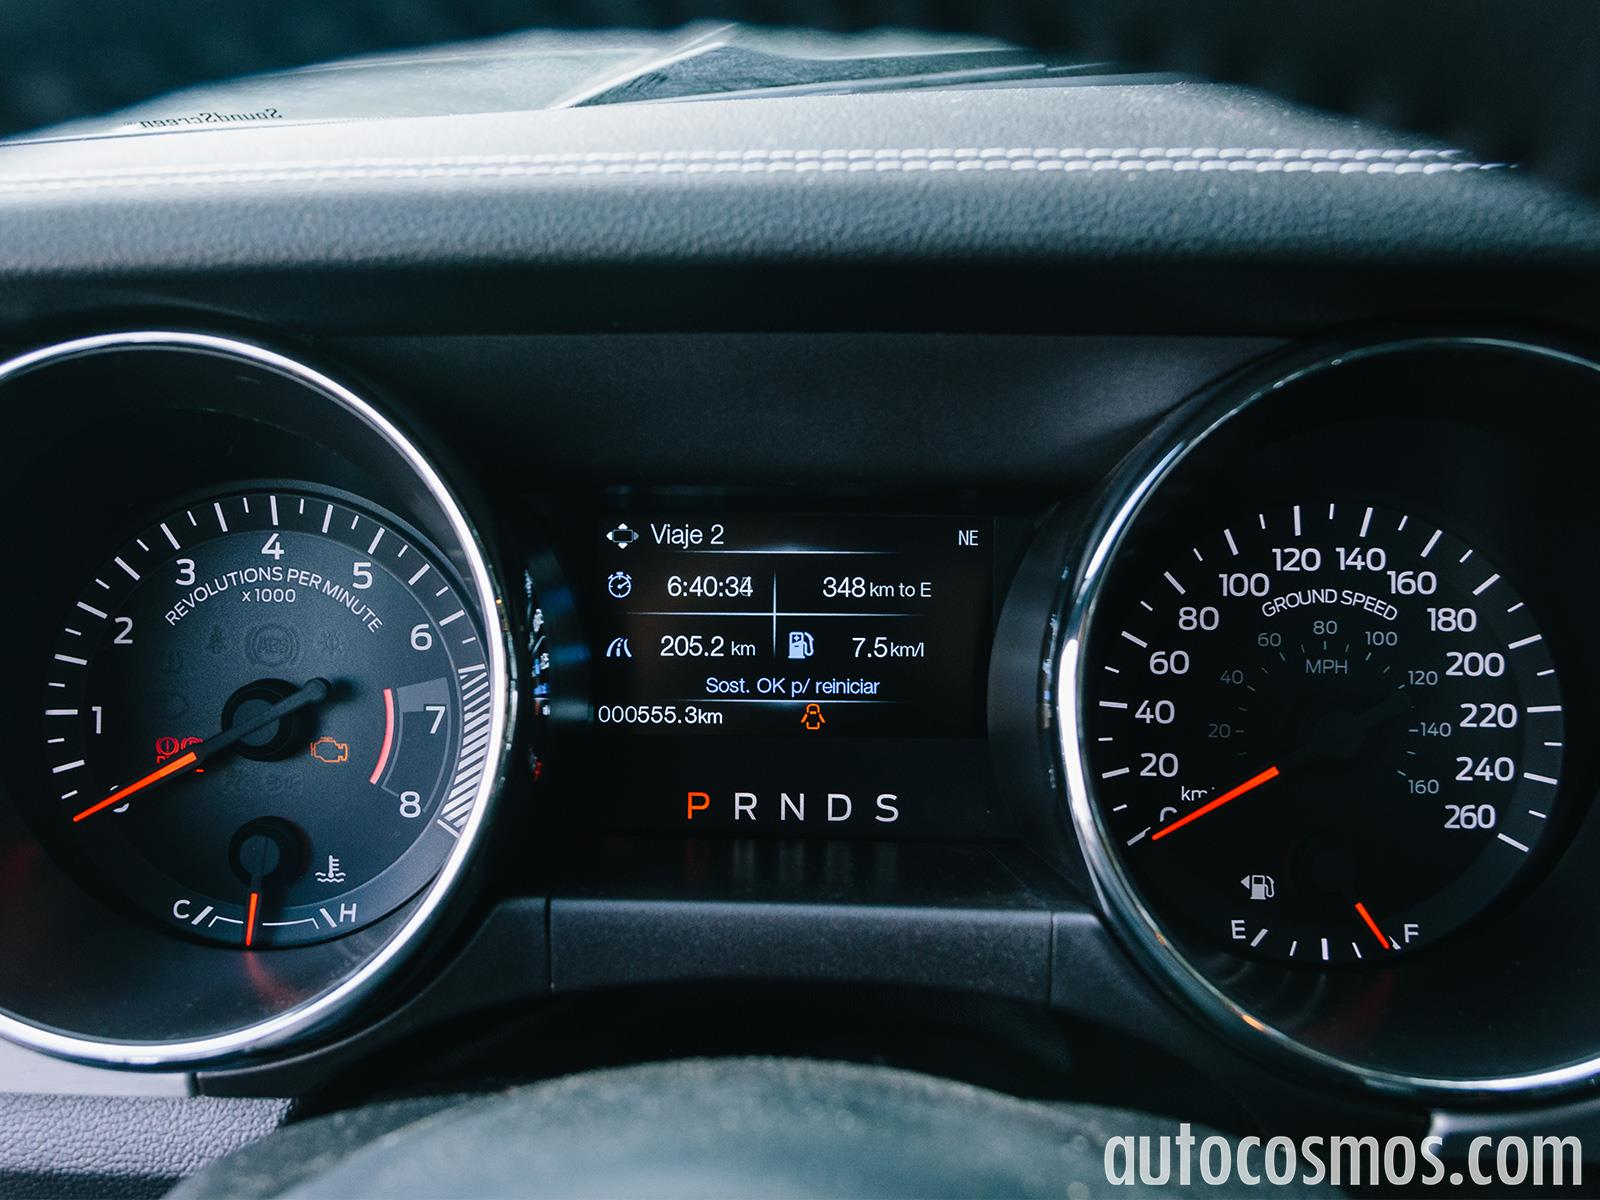 Ford Mustang EcoBoost 2016: Prueba de manejo - Autocosmos.com